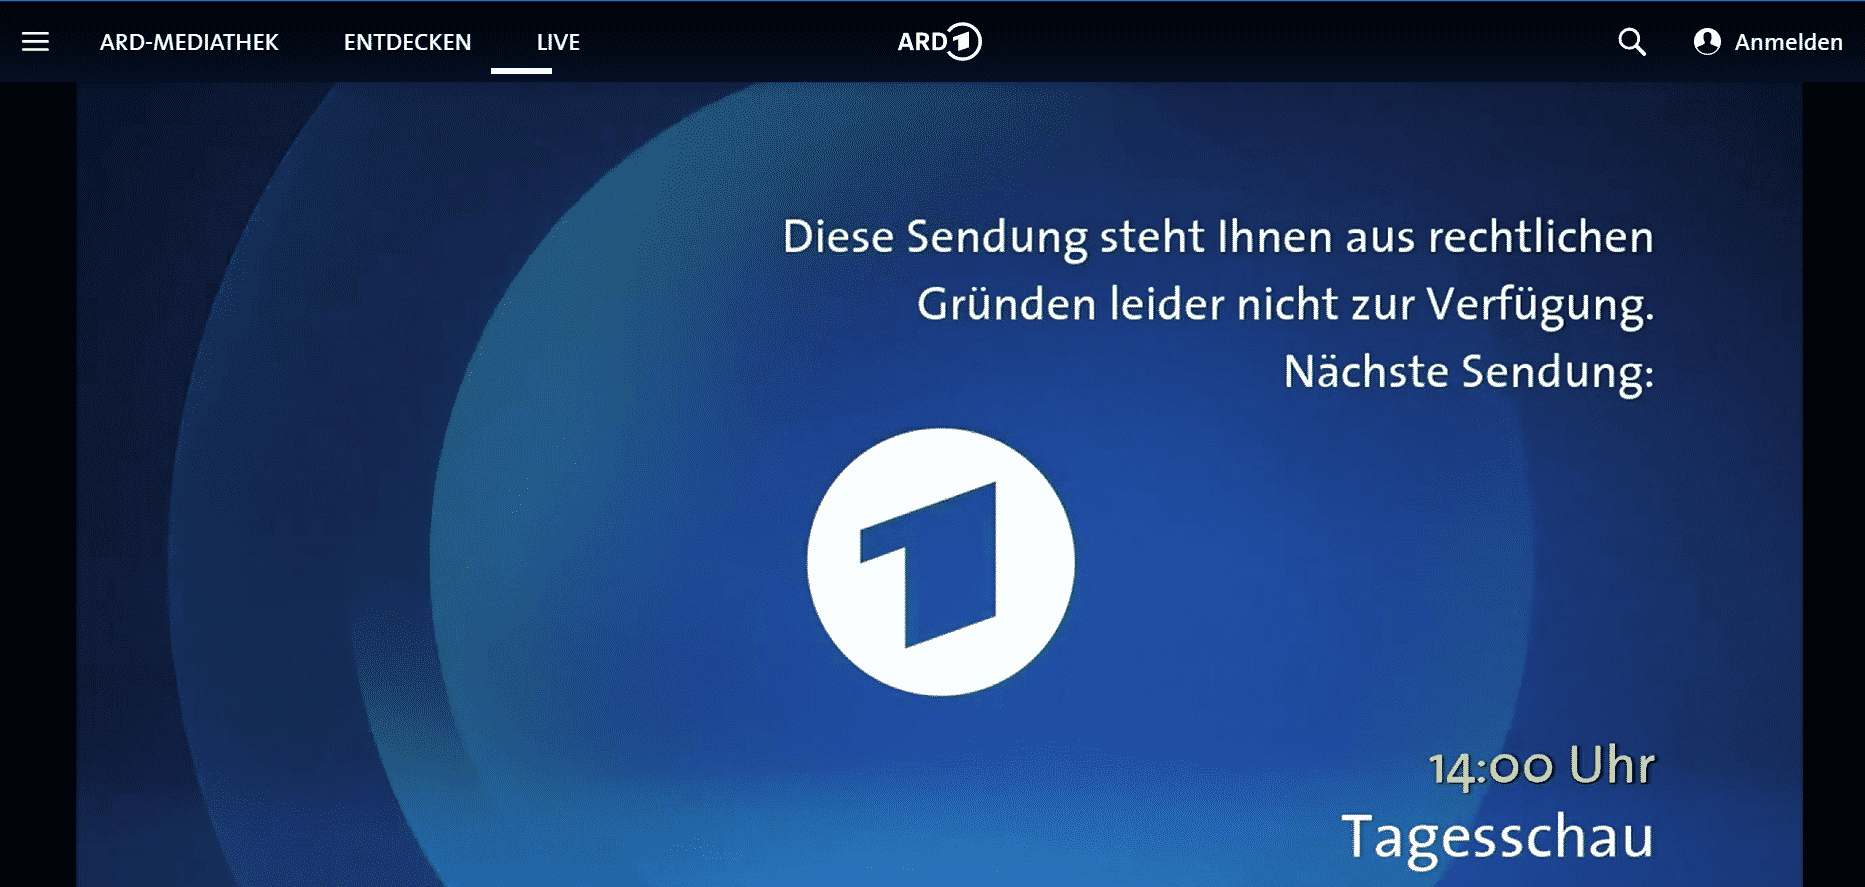 ARD Mediathek im Ausland - Sperre